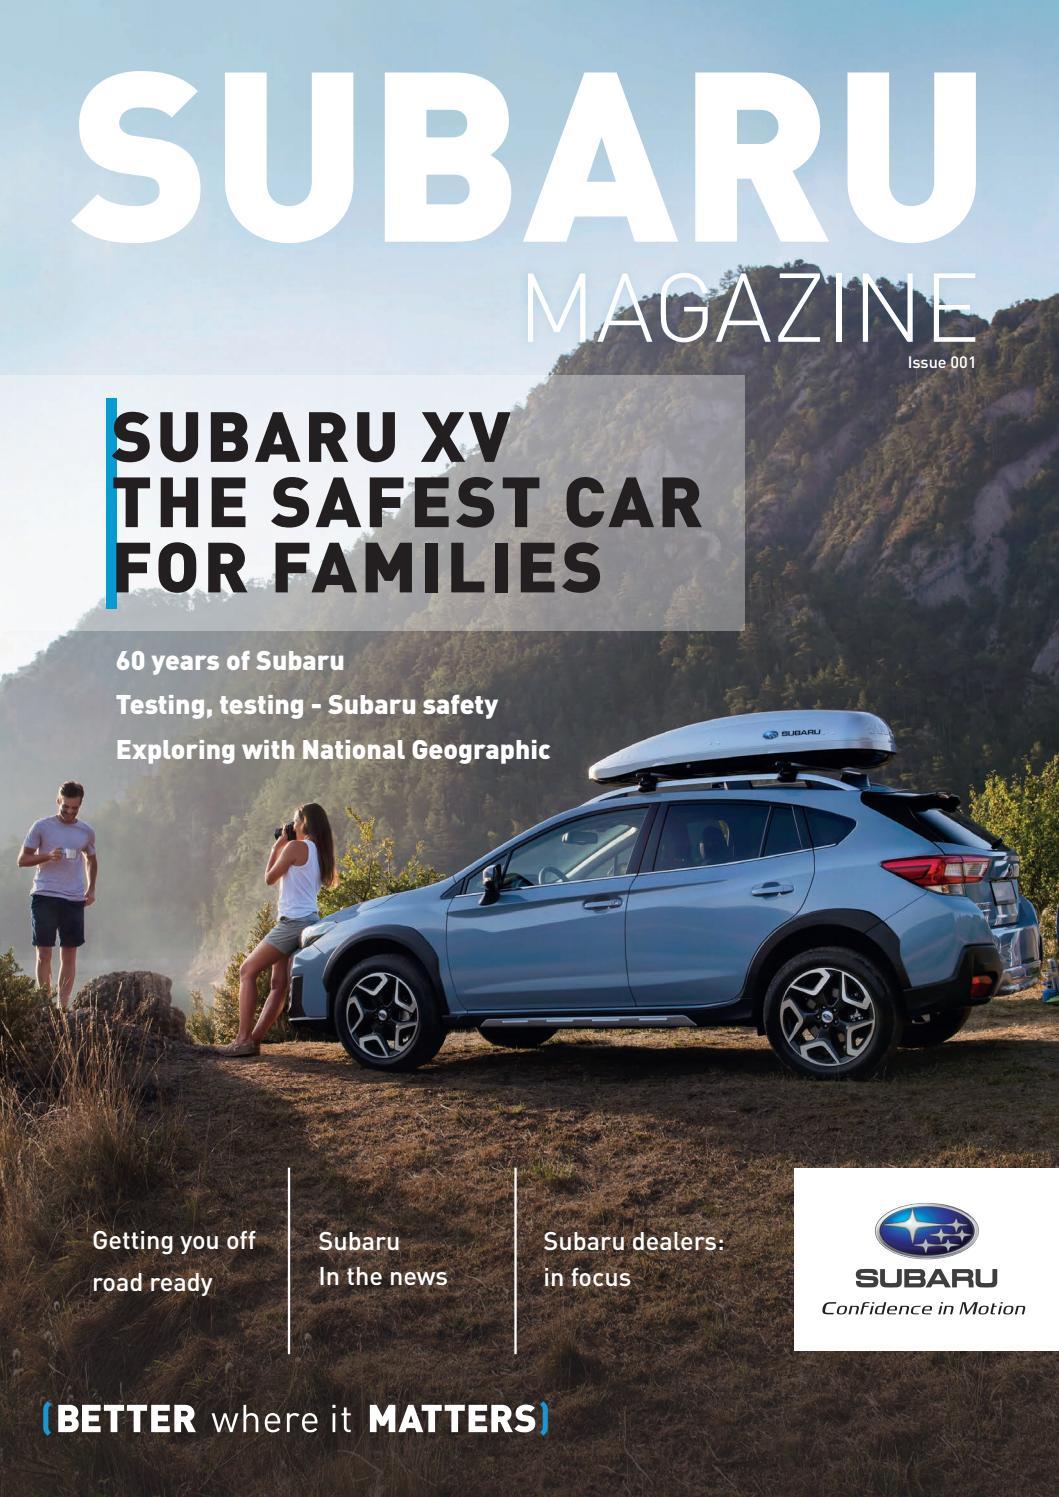 Subaru Magazine - July 2018 by Subaru Magazine - issuu